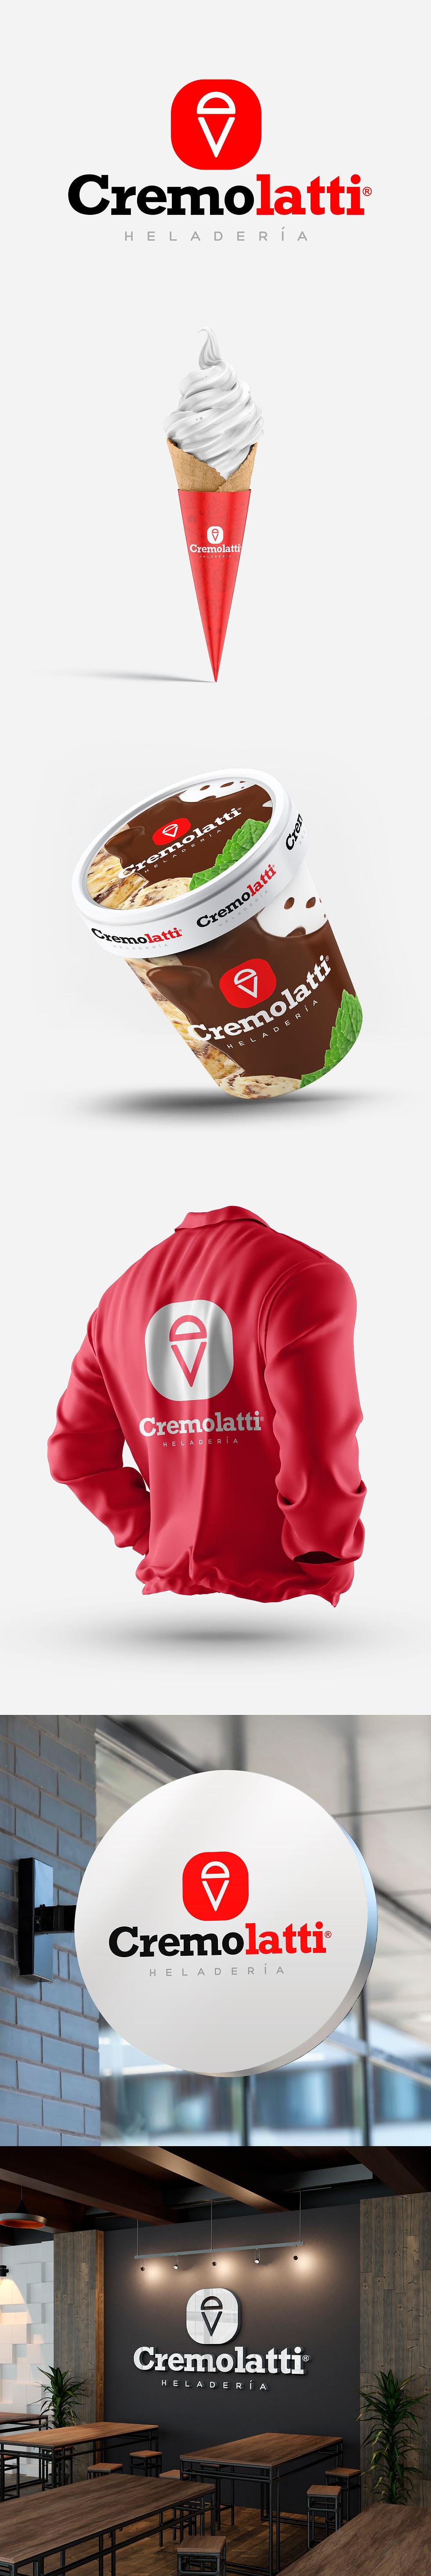 Cremolatti web Visualcorp.jpg